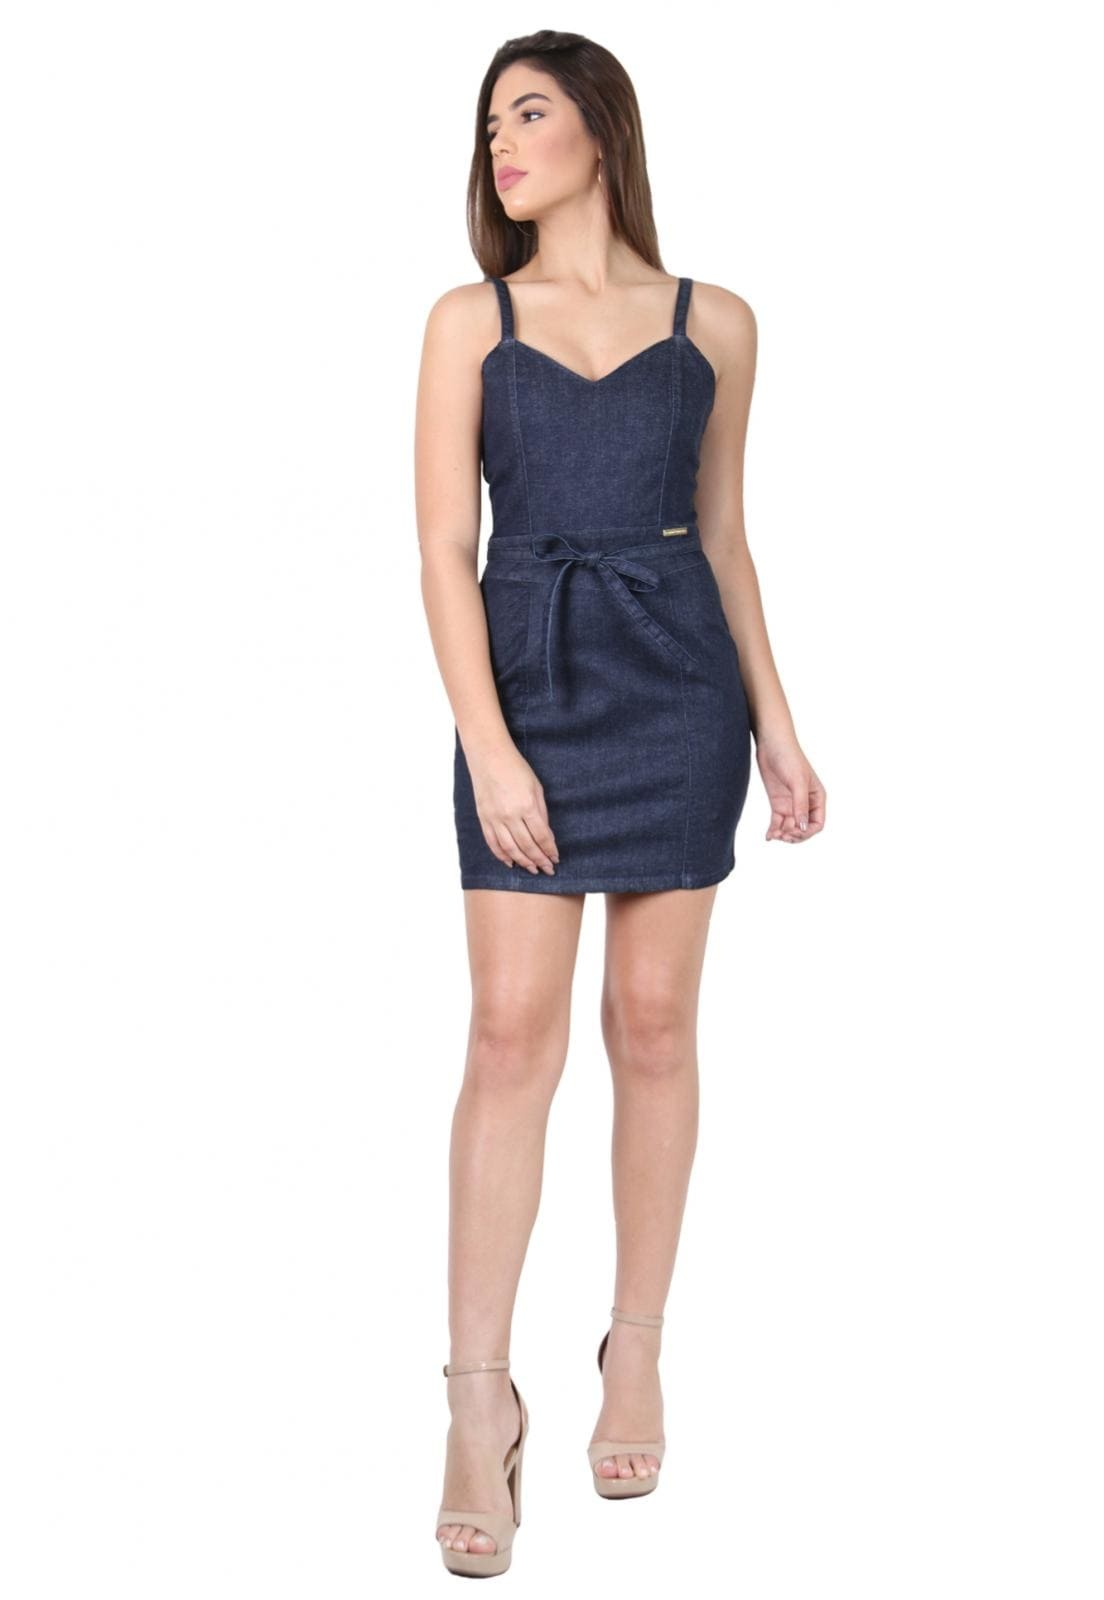 Vestido Curto Laço Azul